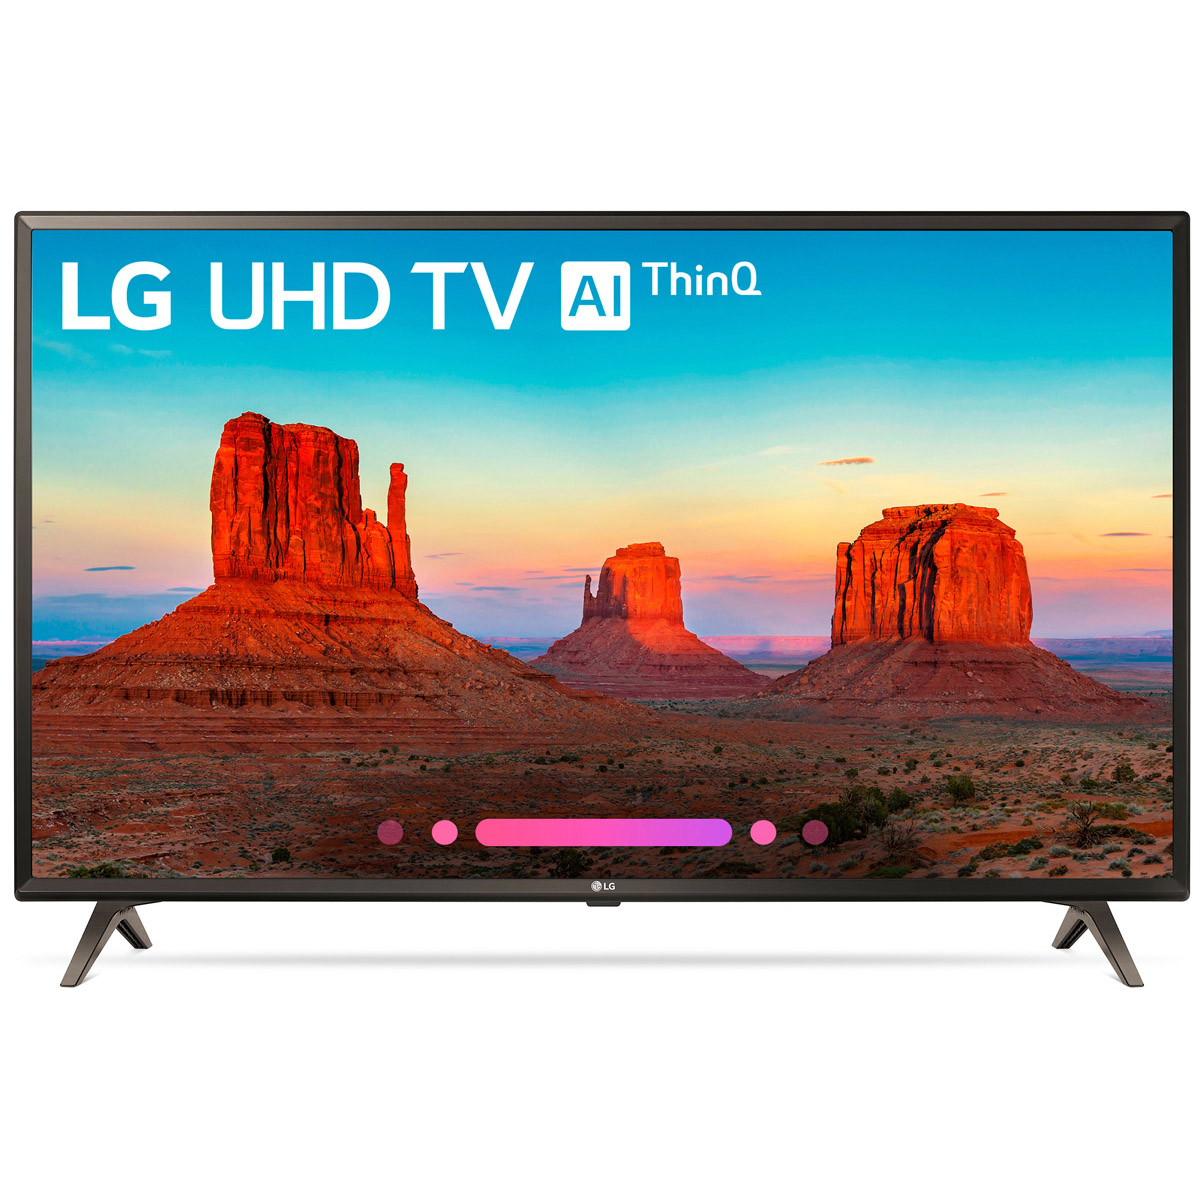 LG Electronics 43UK6300PUE 43Inch 4K UHD LED Smart AI TV